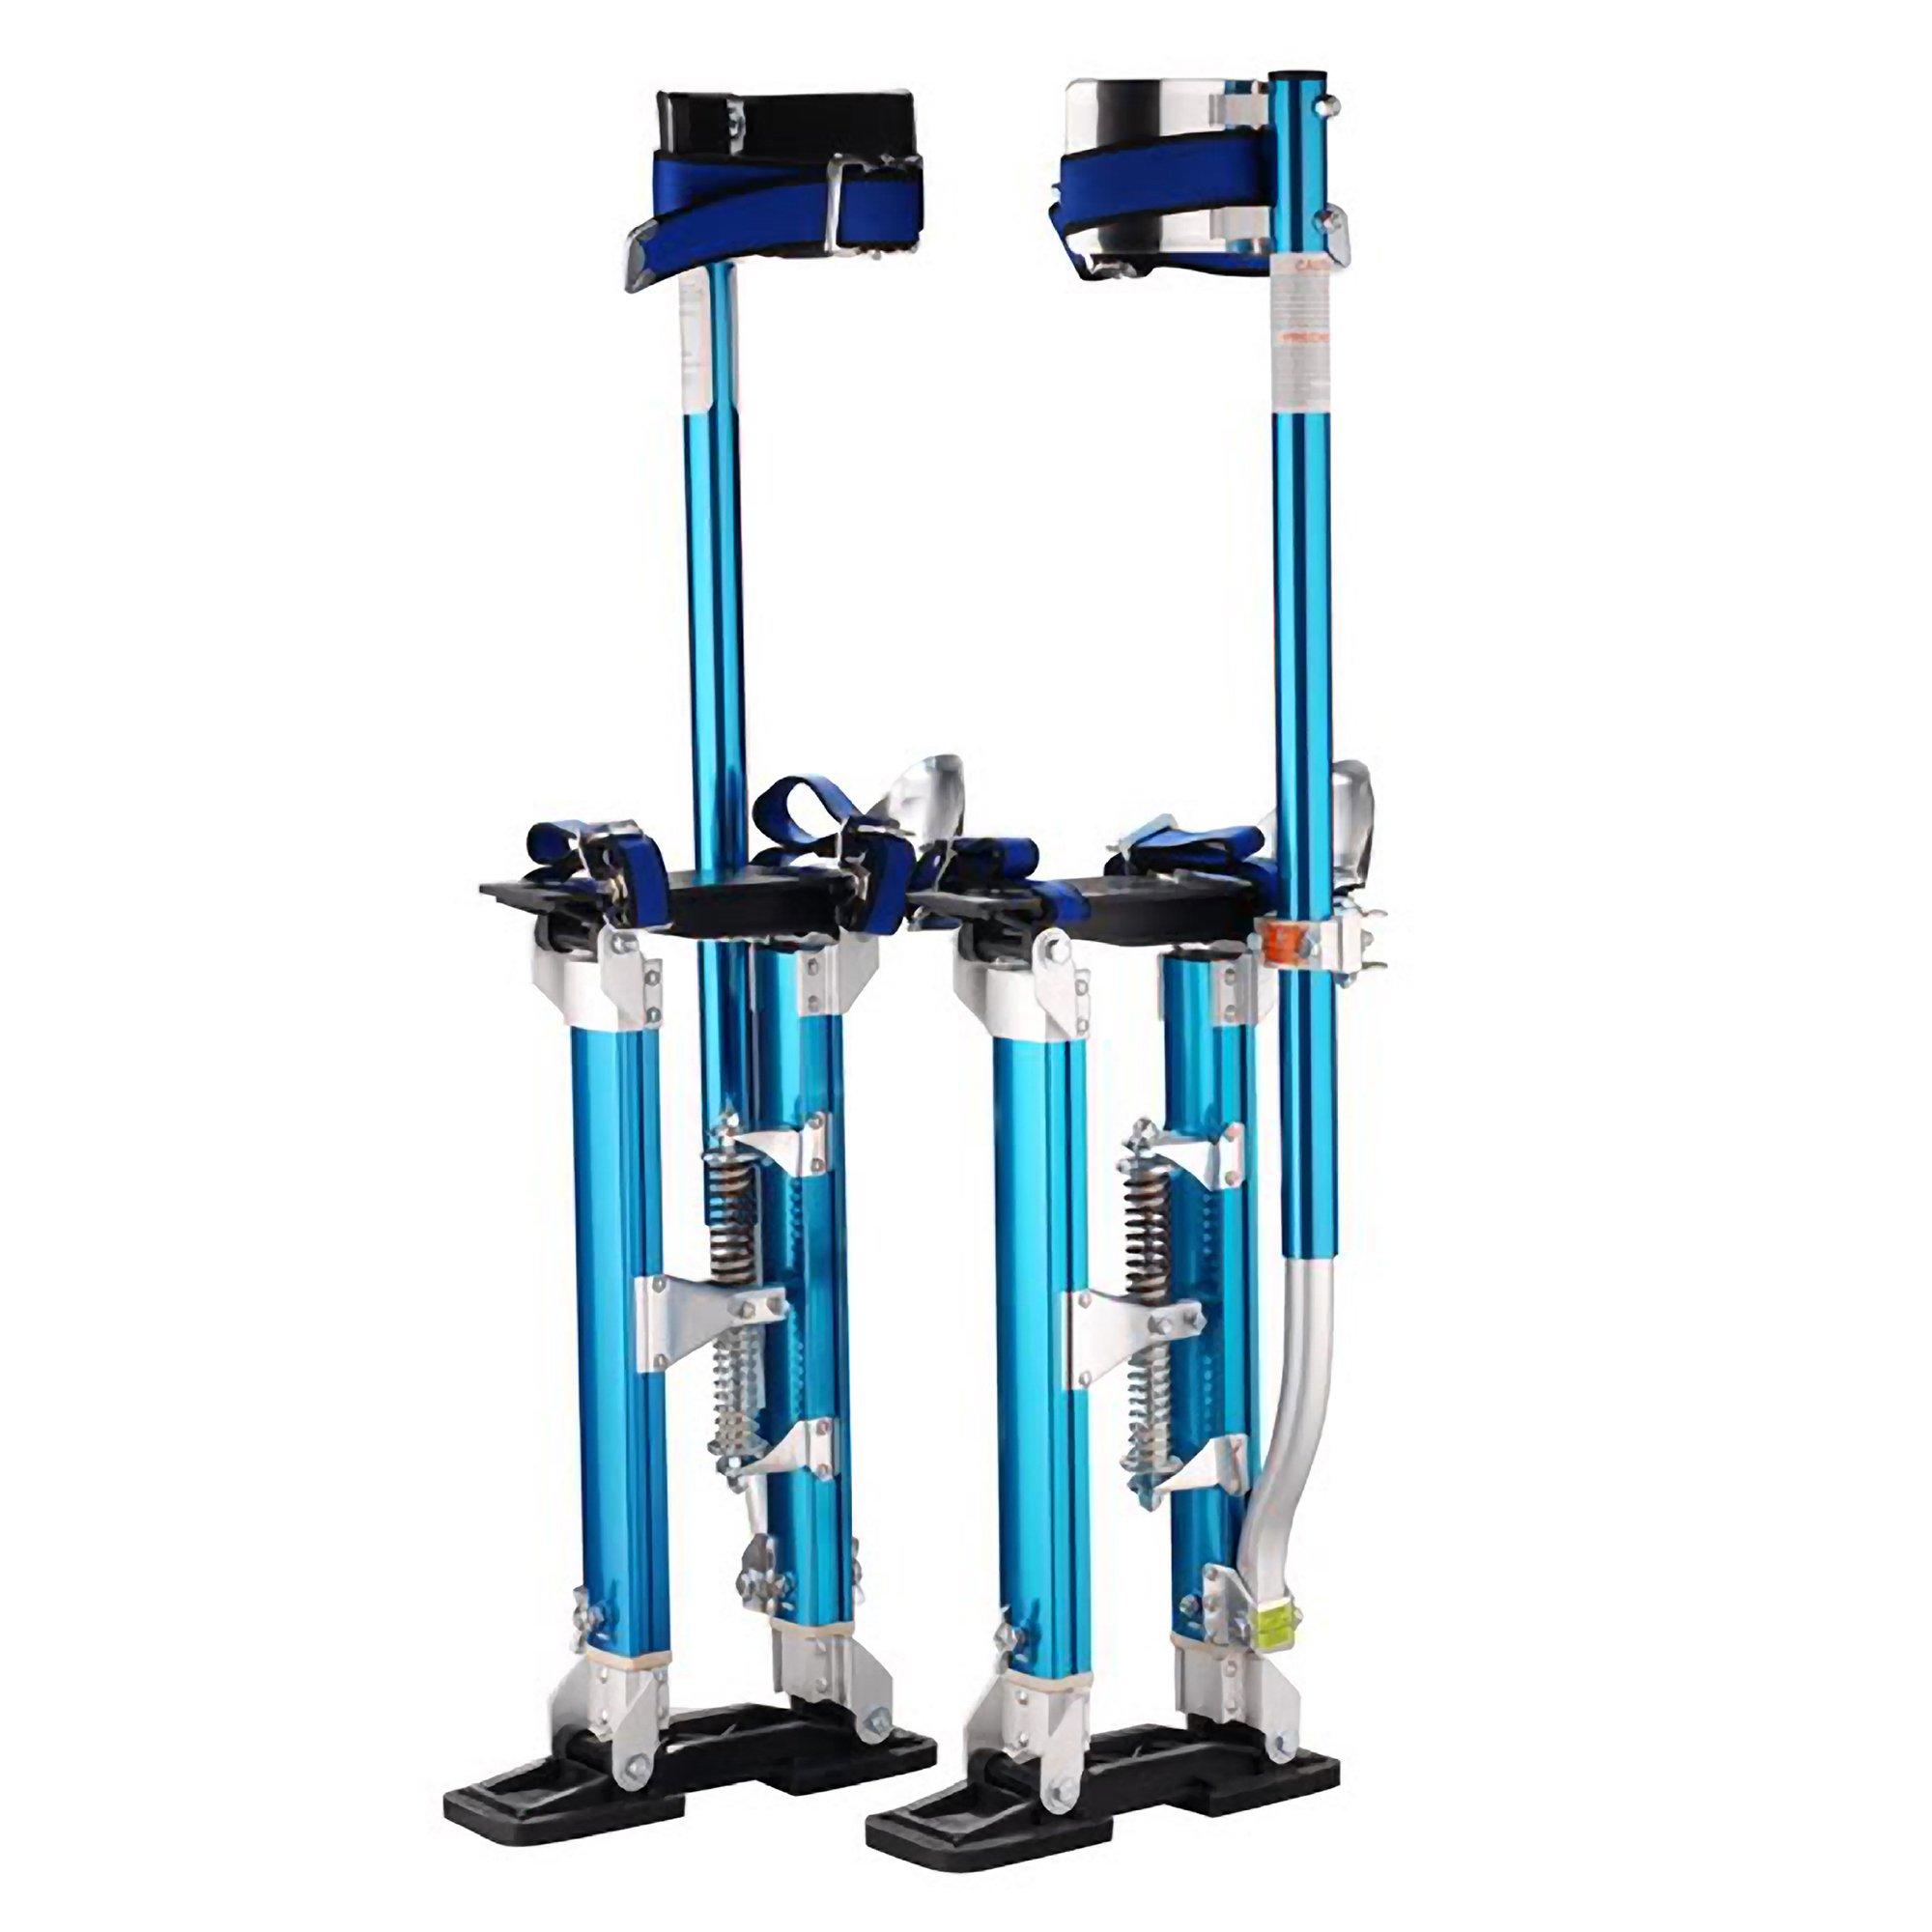 Pentagon Tool Professional 24''-40'' Blue Drywall Stilts Highest Quality by Pentagon Tools